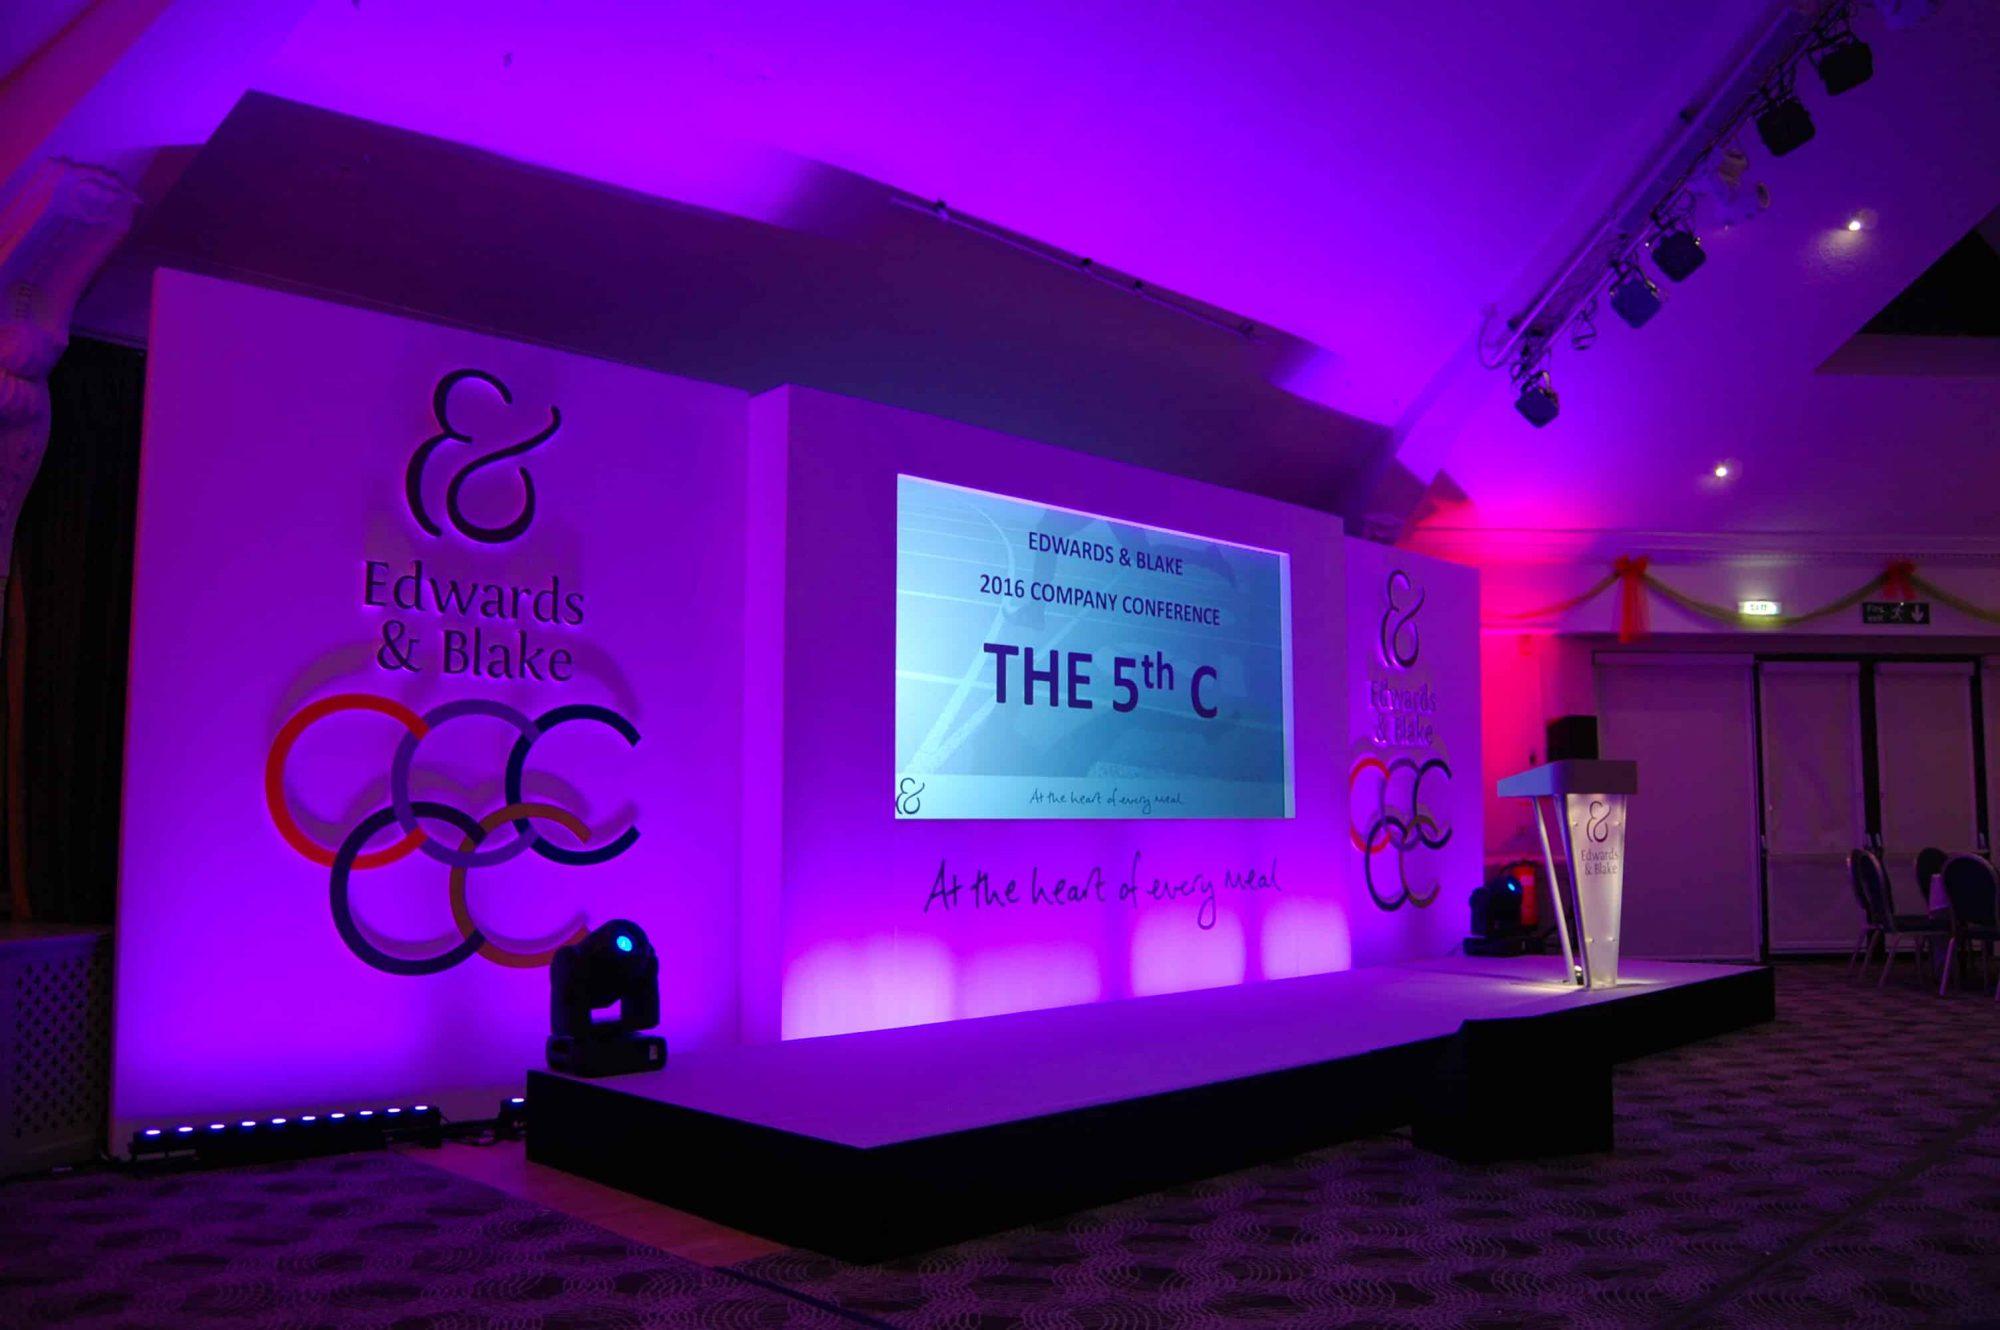 edwards & blake company conference